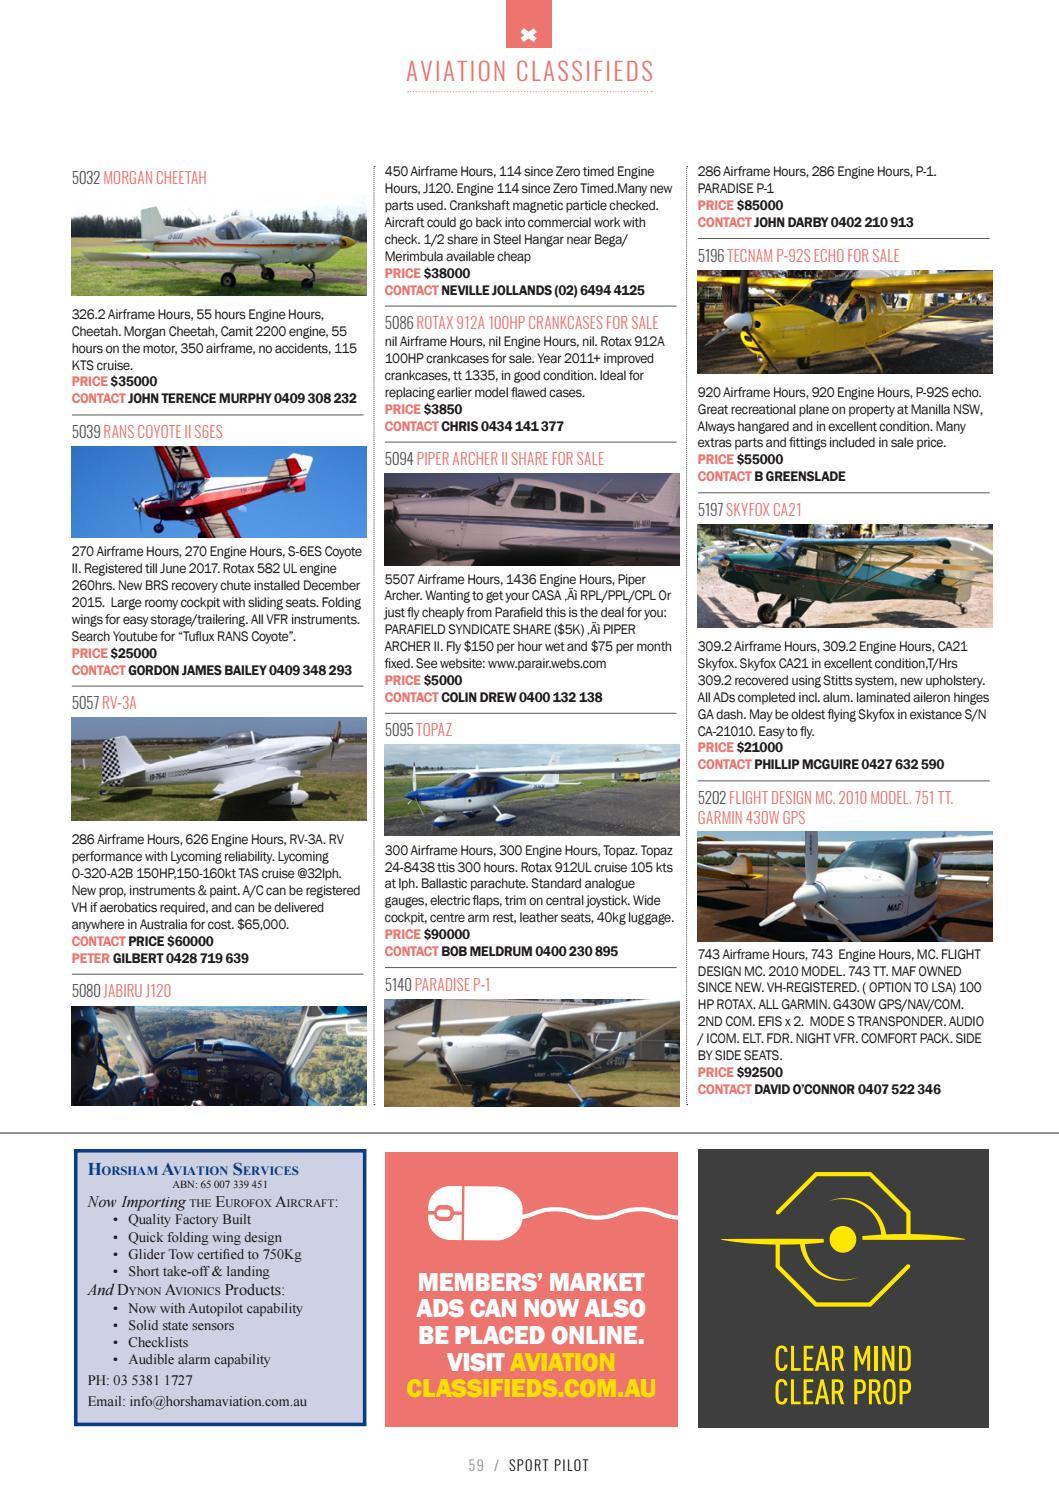 Sport pilot 75 nov 2017 by Recreational Aviation Australia - issuu